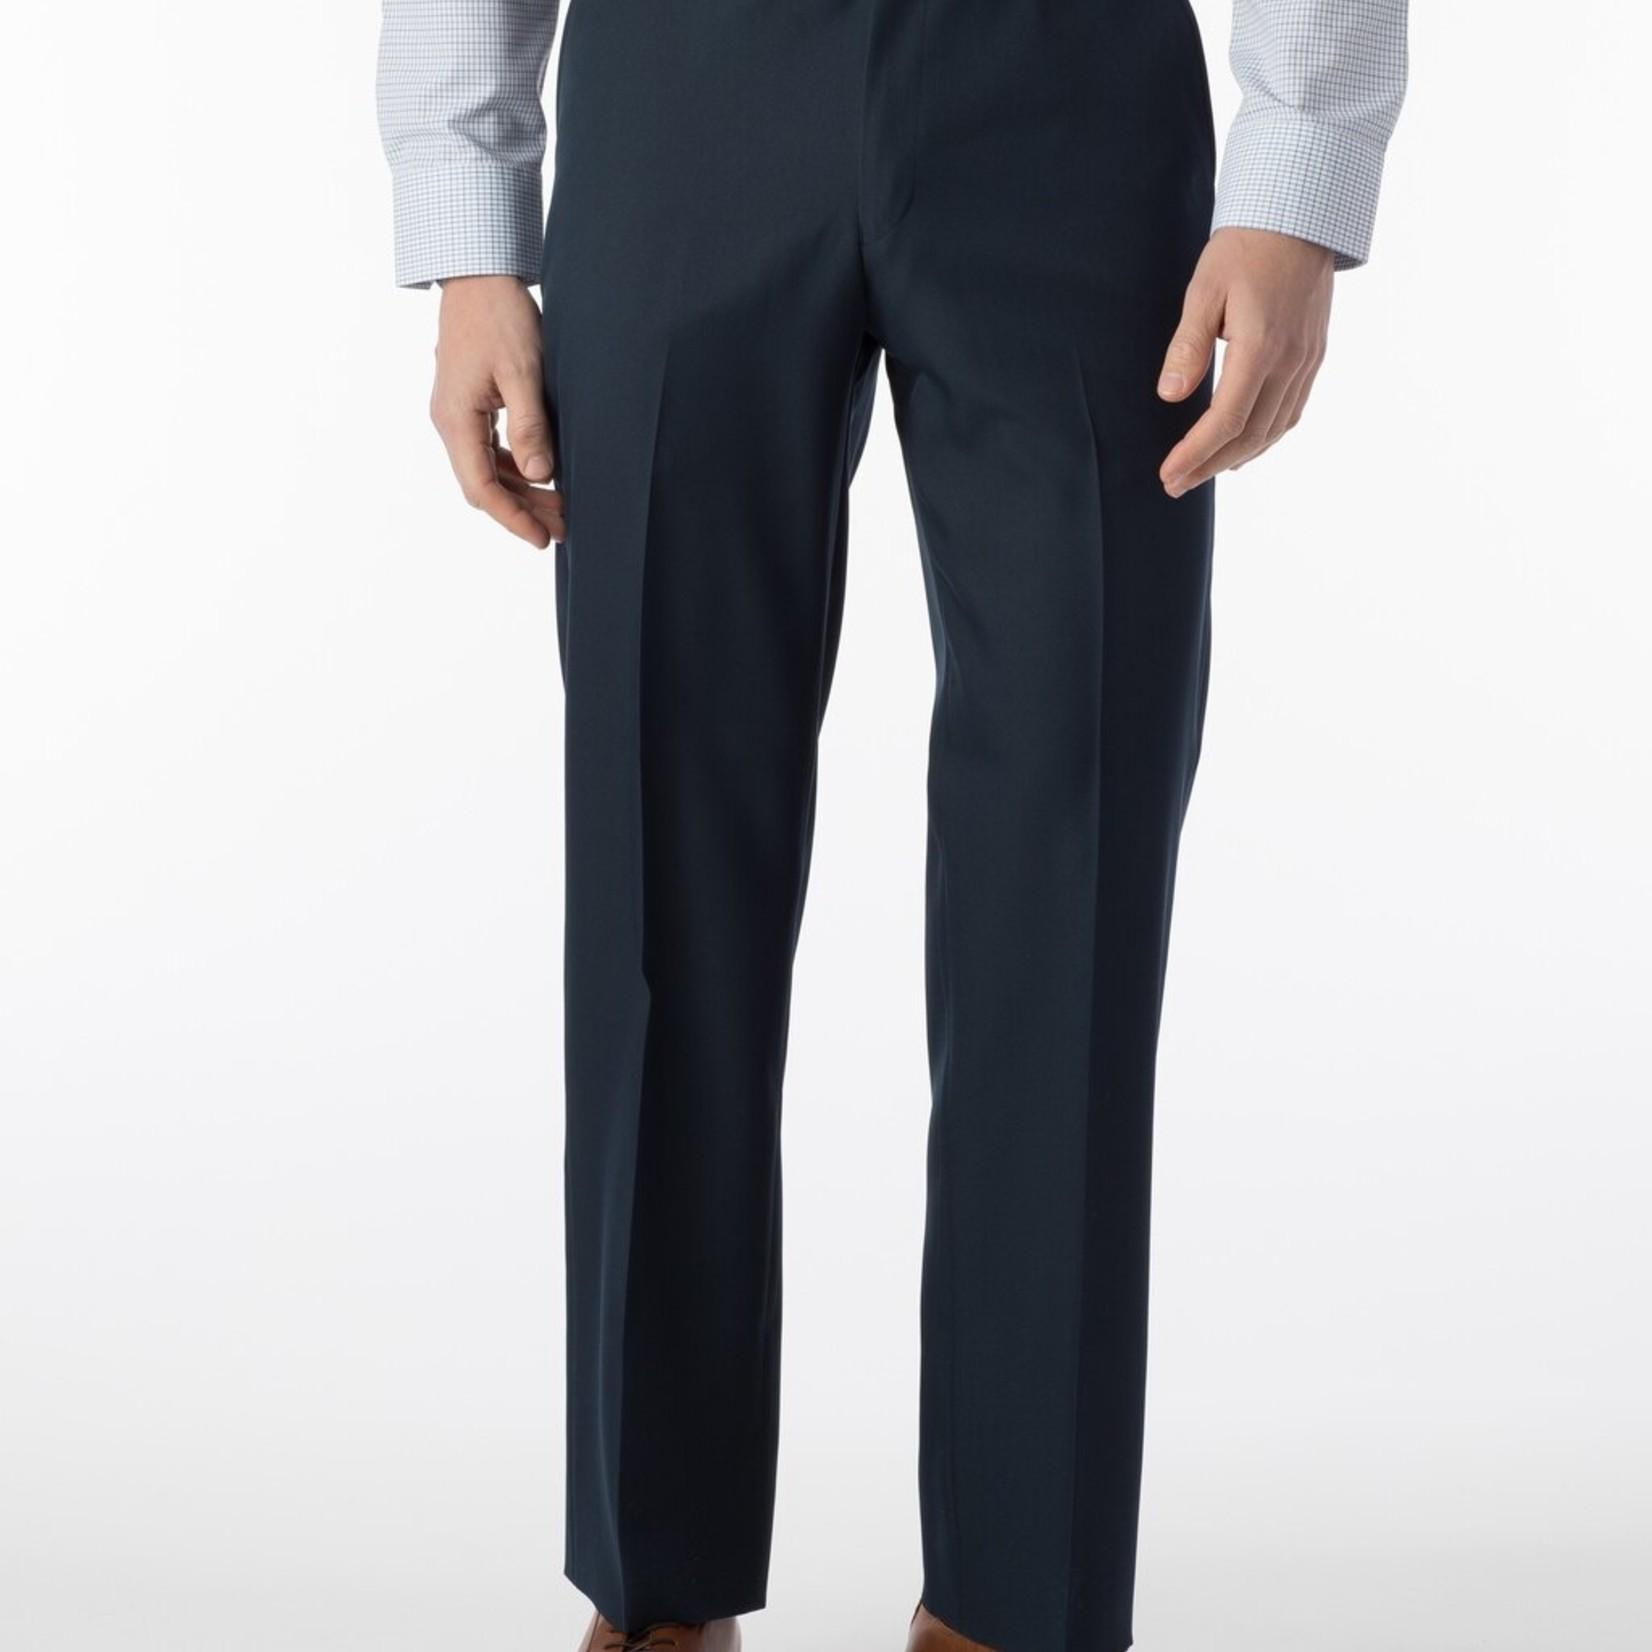 Ballin Microfiber EZE Dress Pant